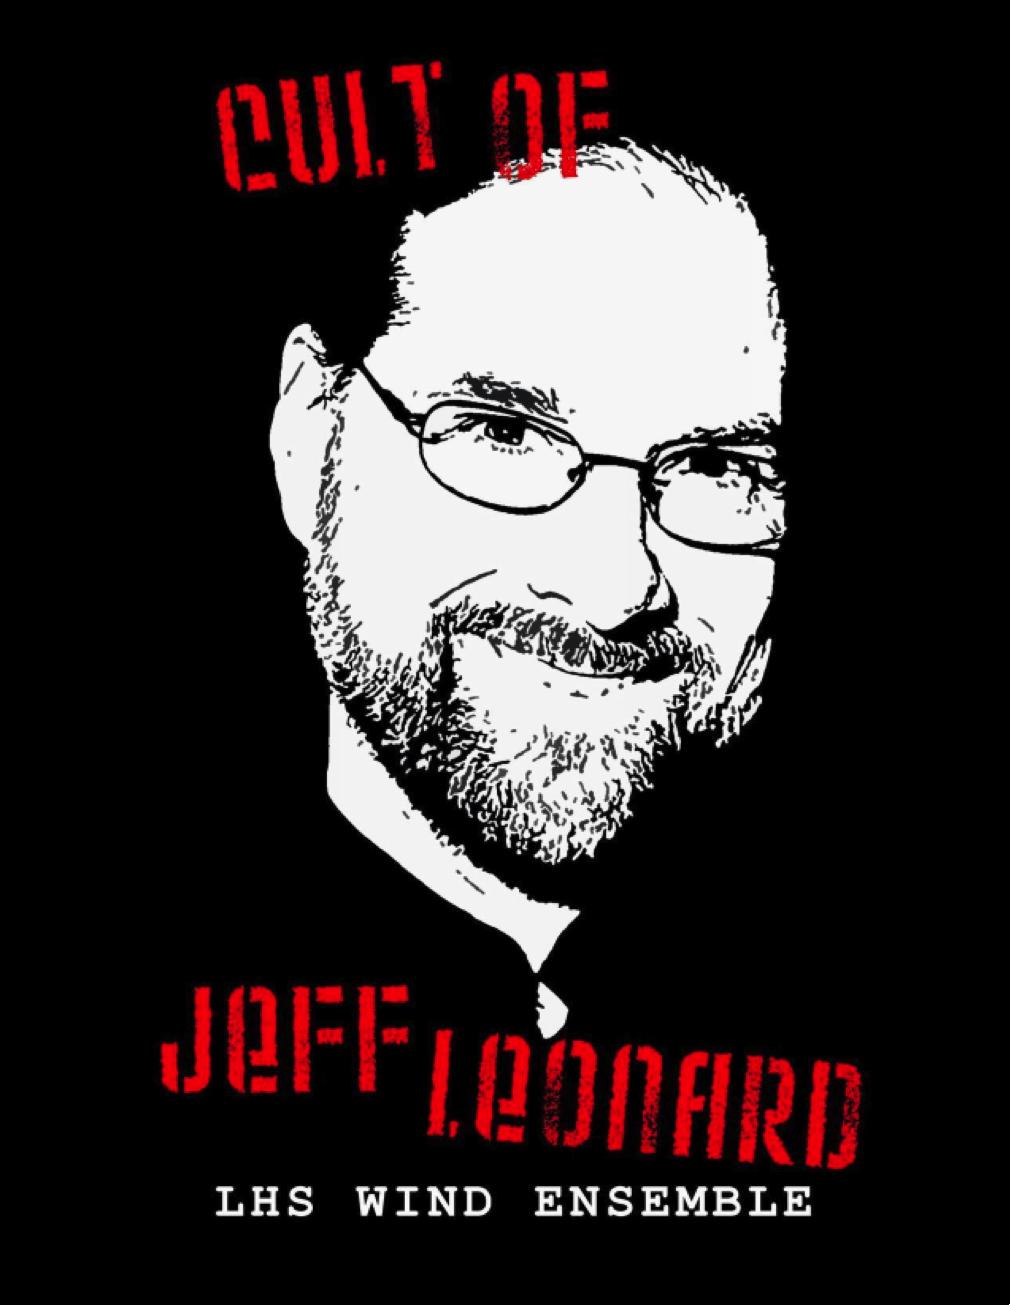 CultJeffLeonard